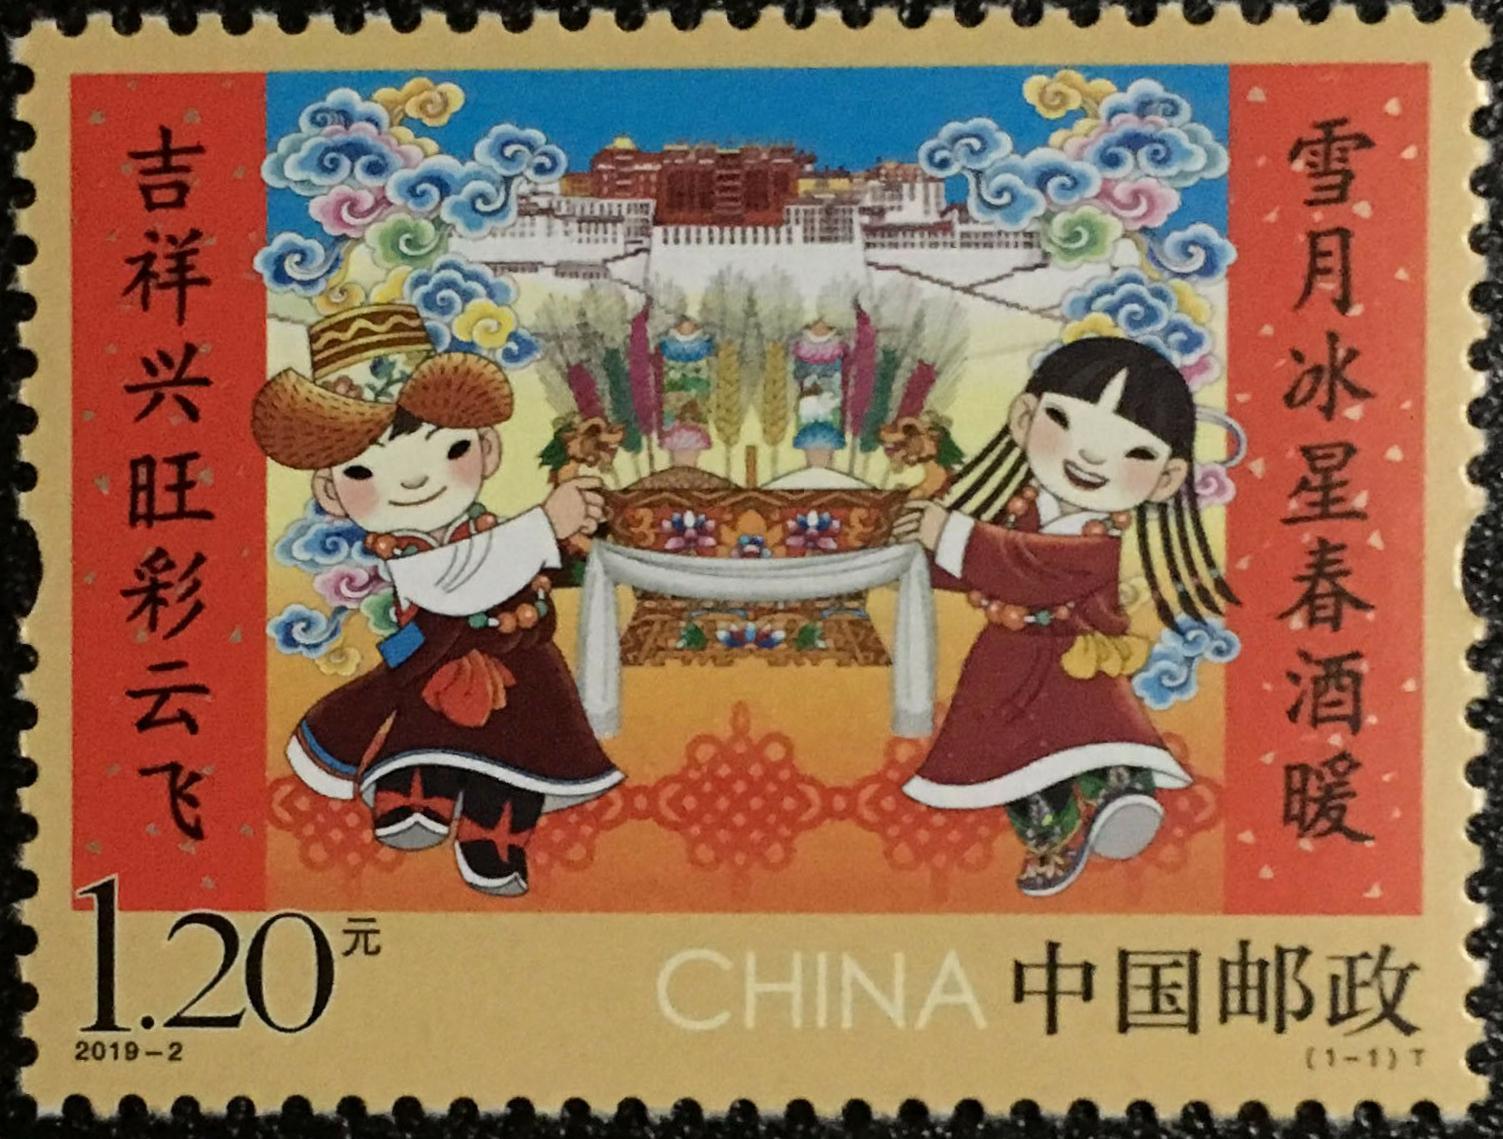 China, PRC - Chinese New Year Greetings Stamp (January 10, 2019)